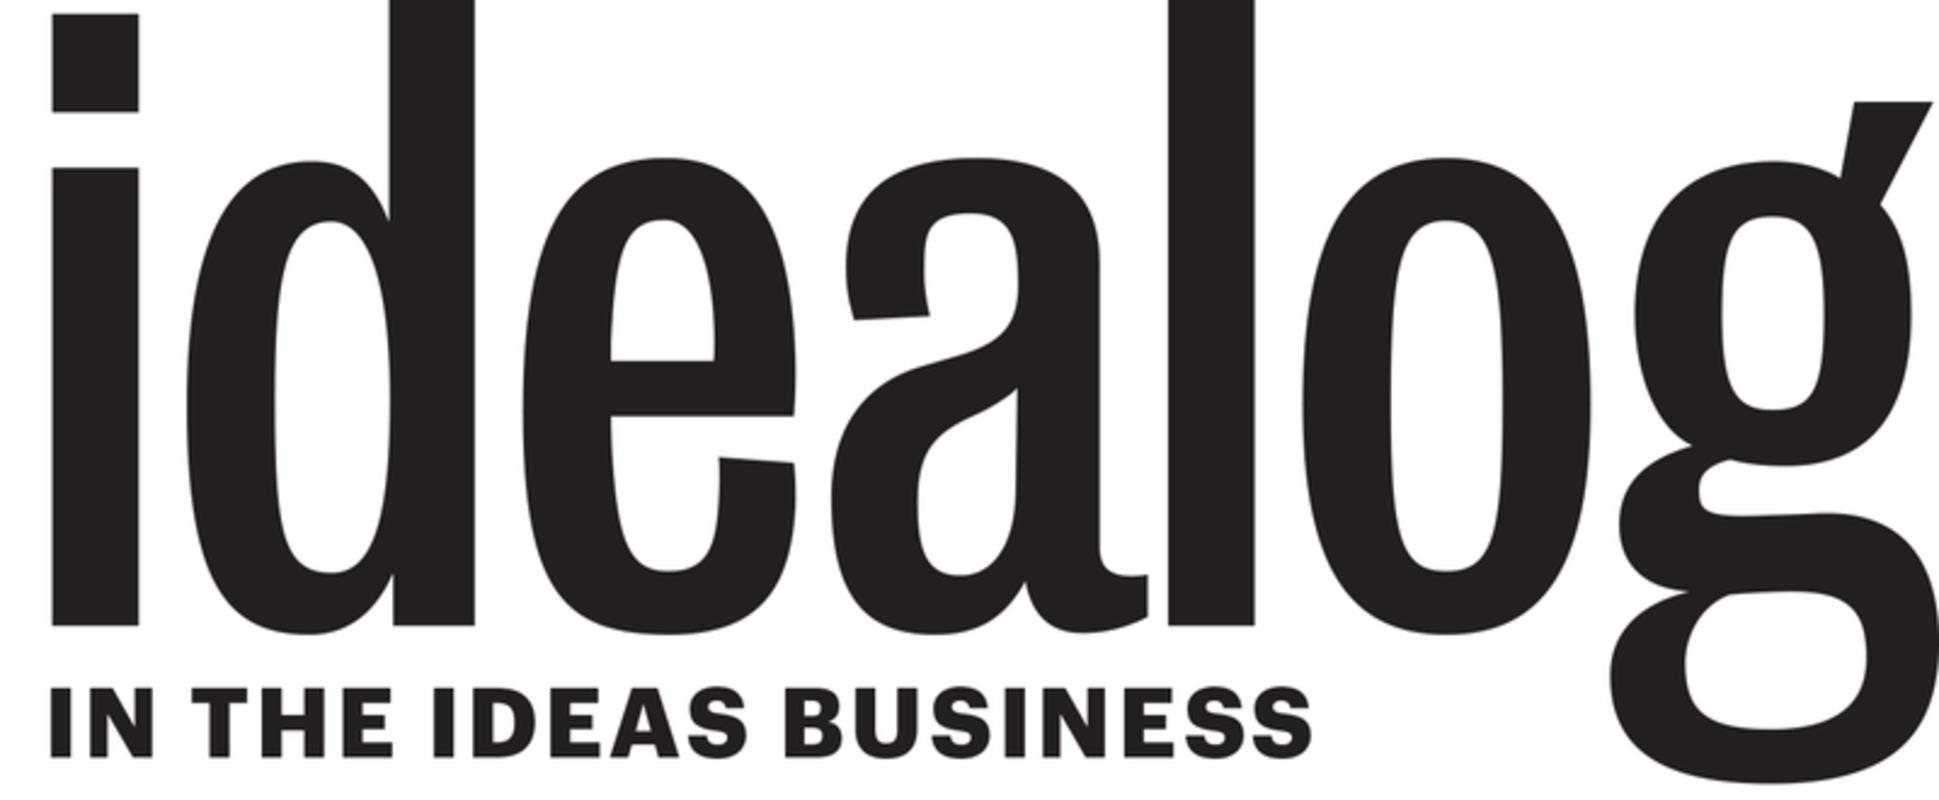 Idealog logo with tag